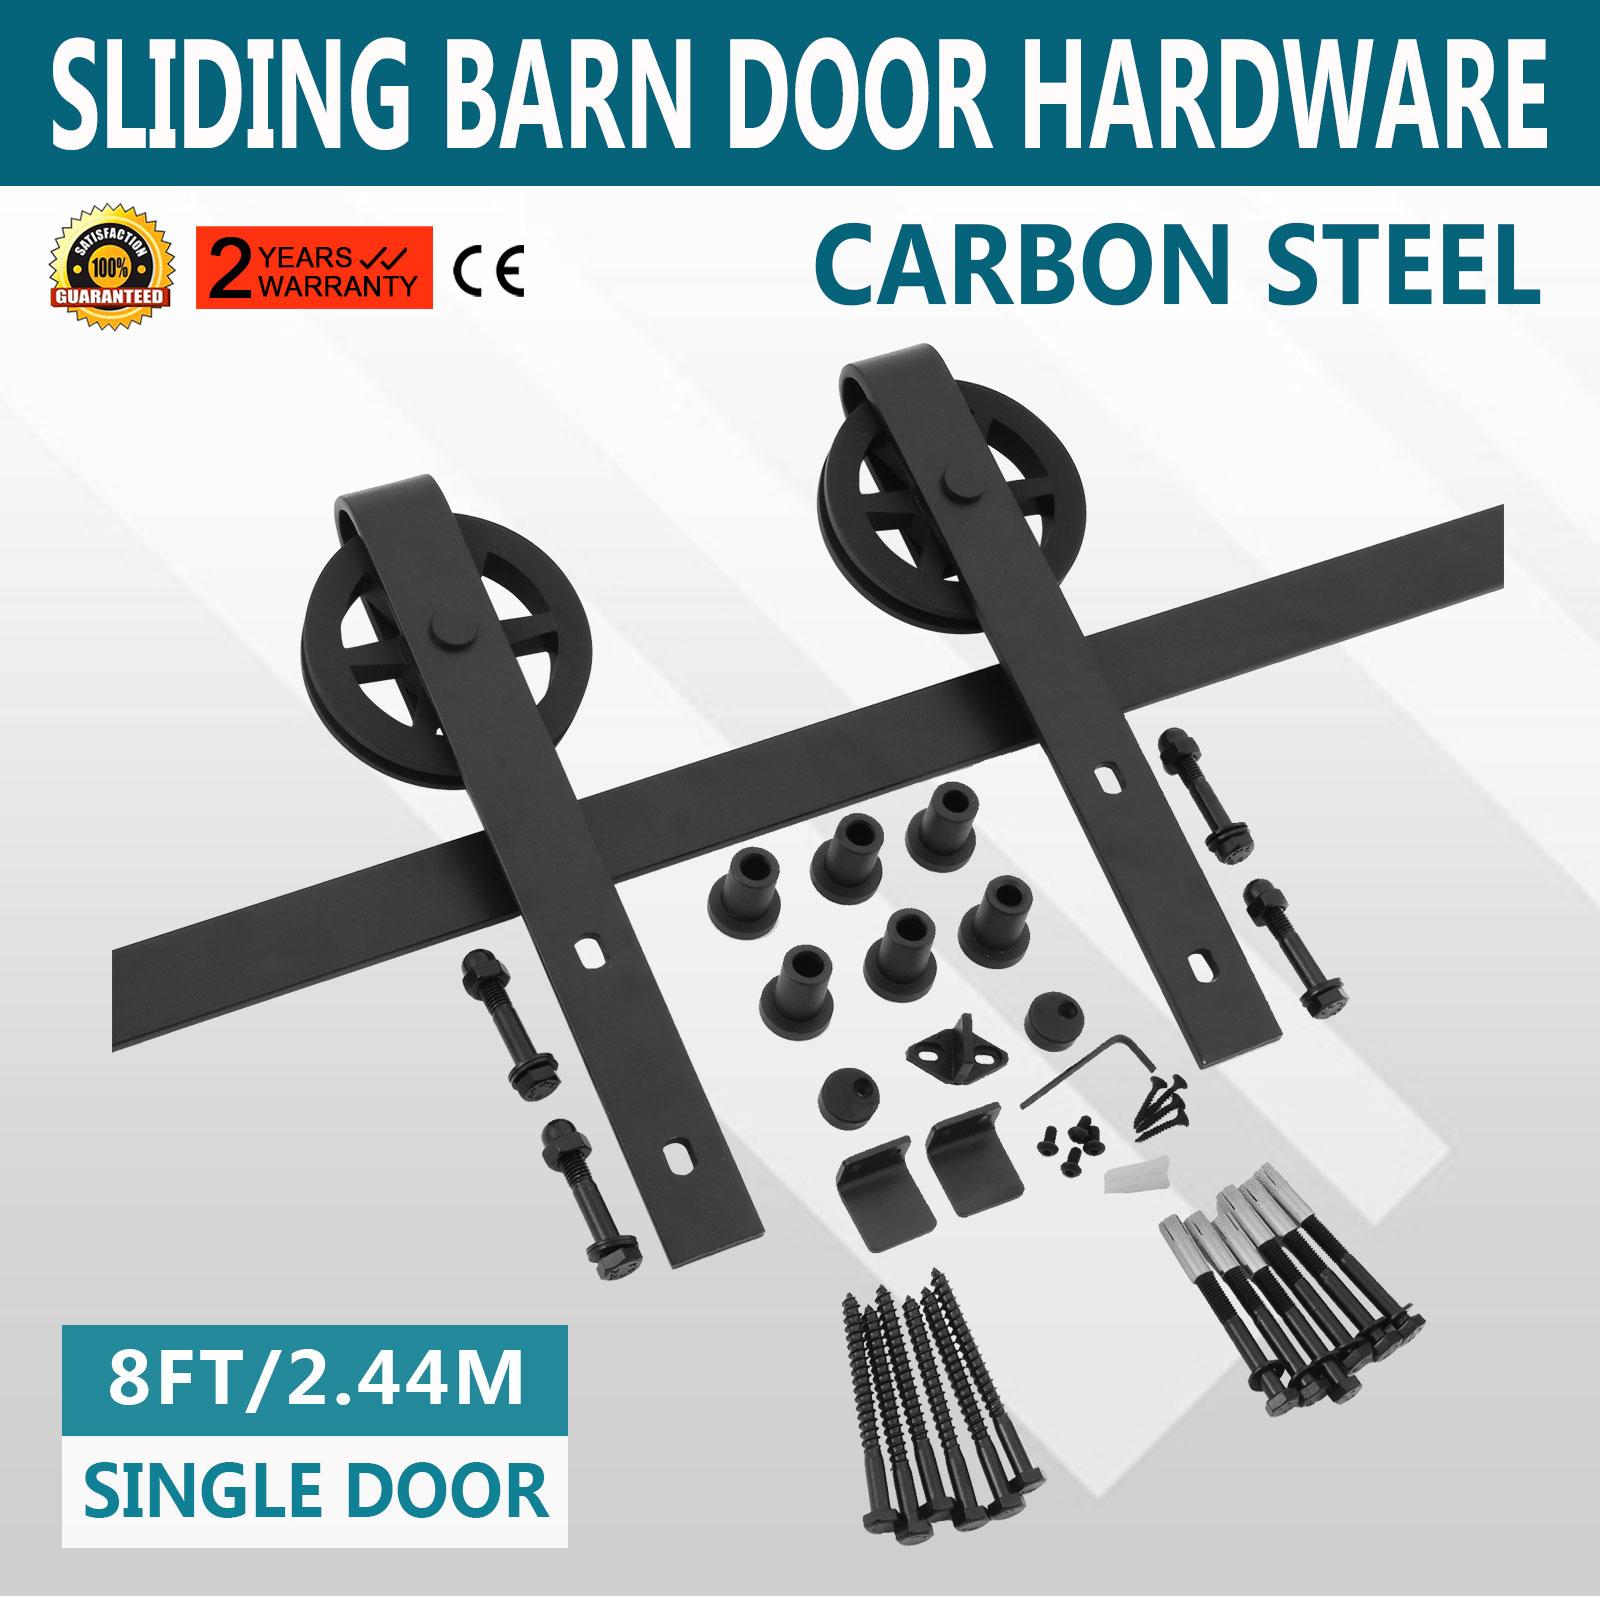 244m Sliding Barn Wood Door Hardware Track Kit Carbon Steel Roller